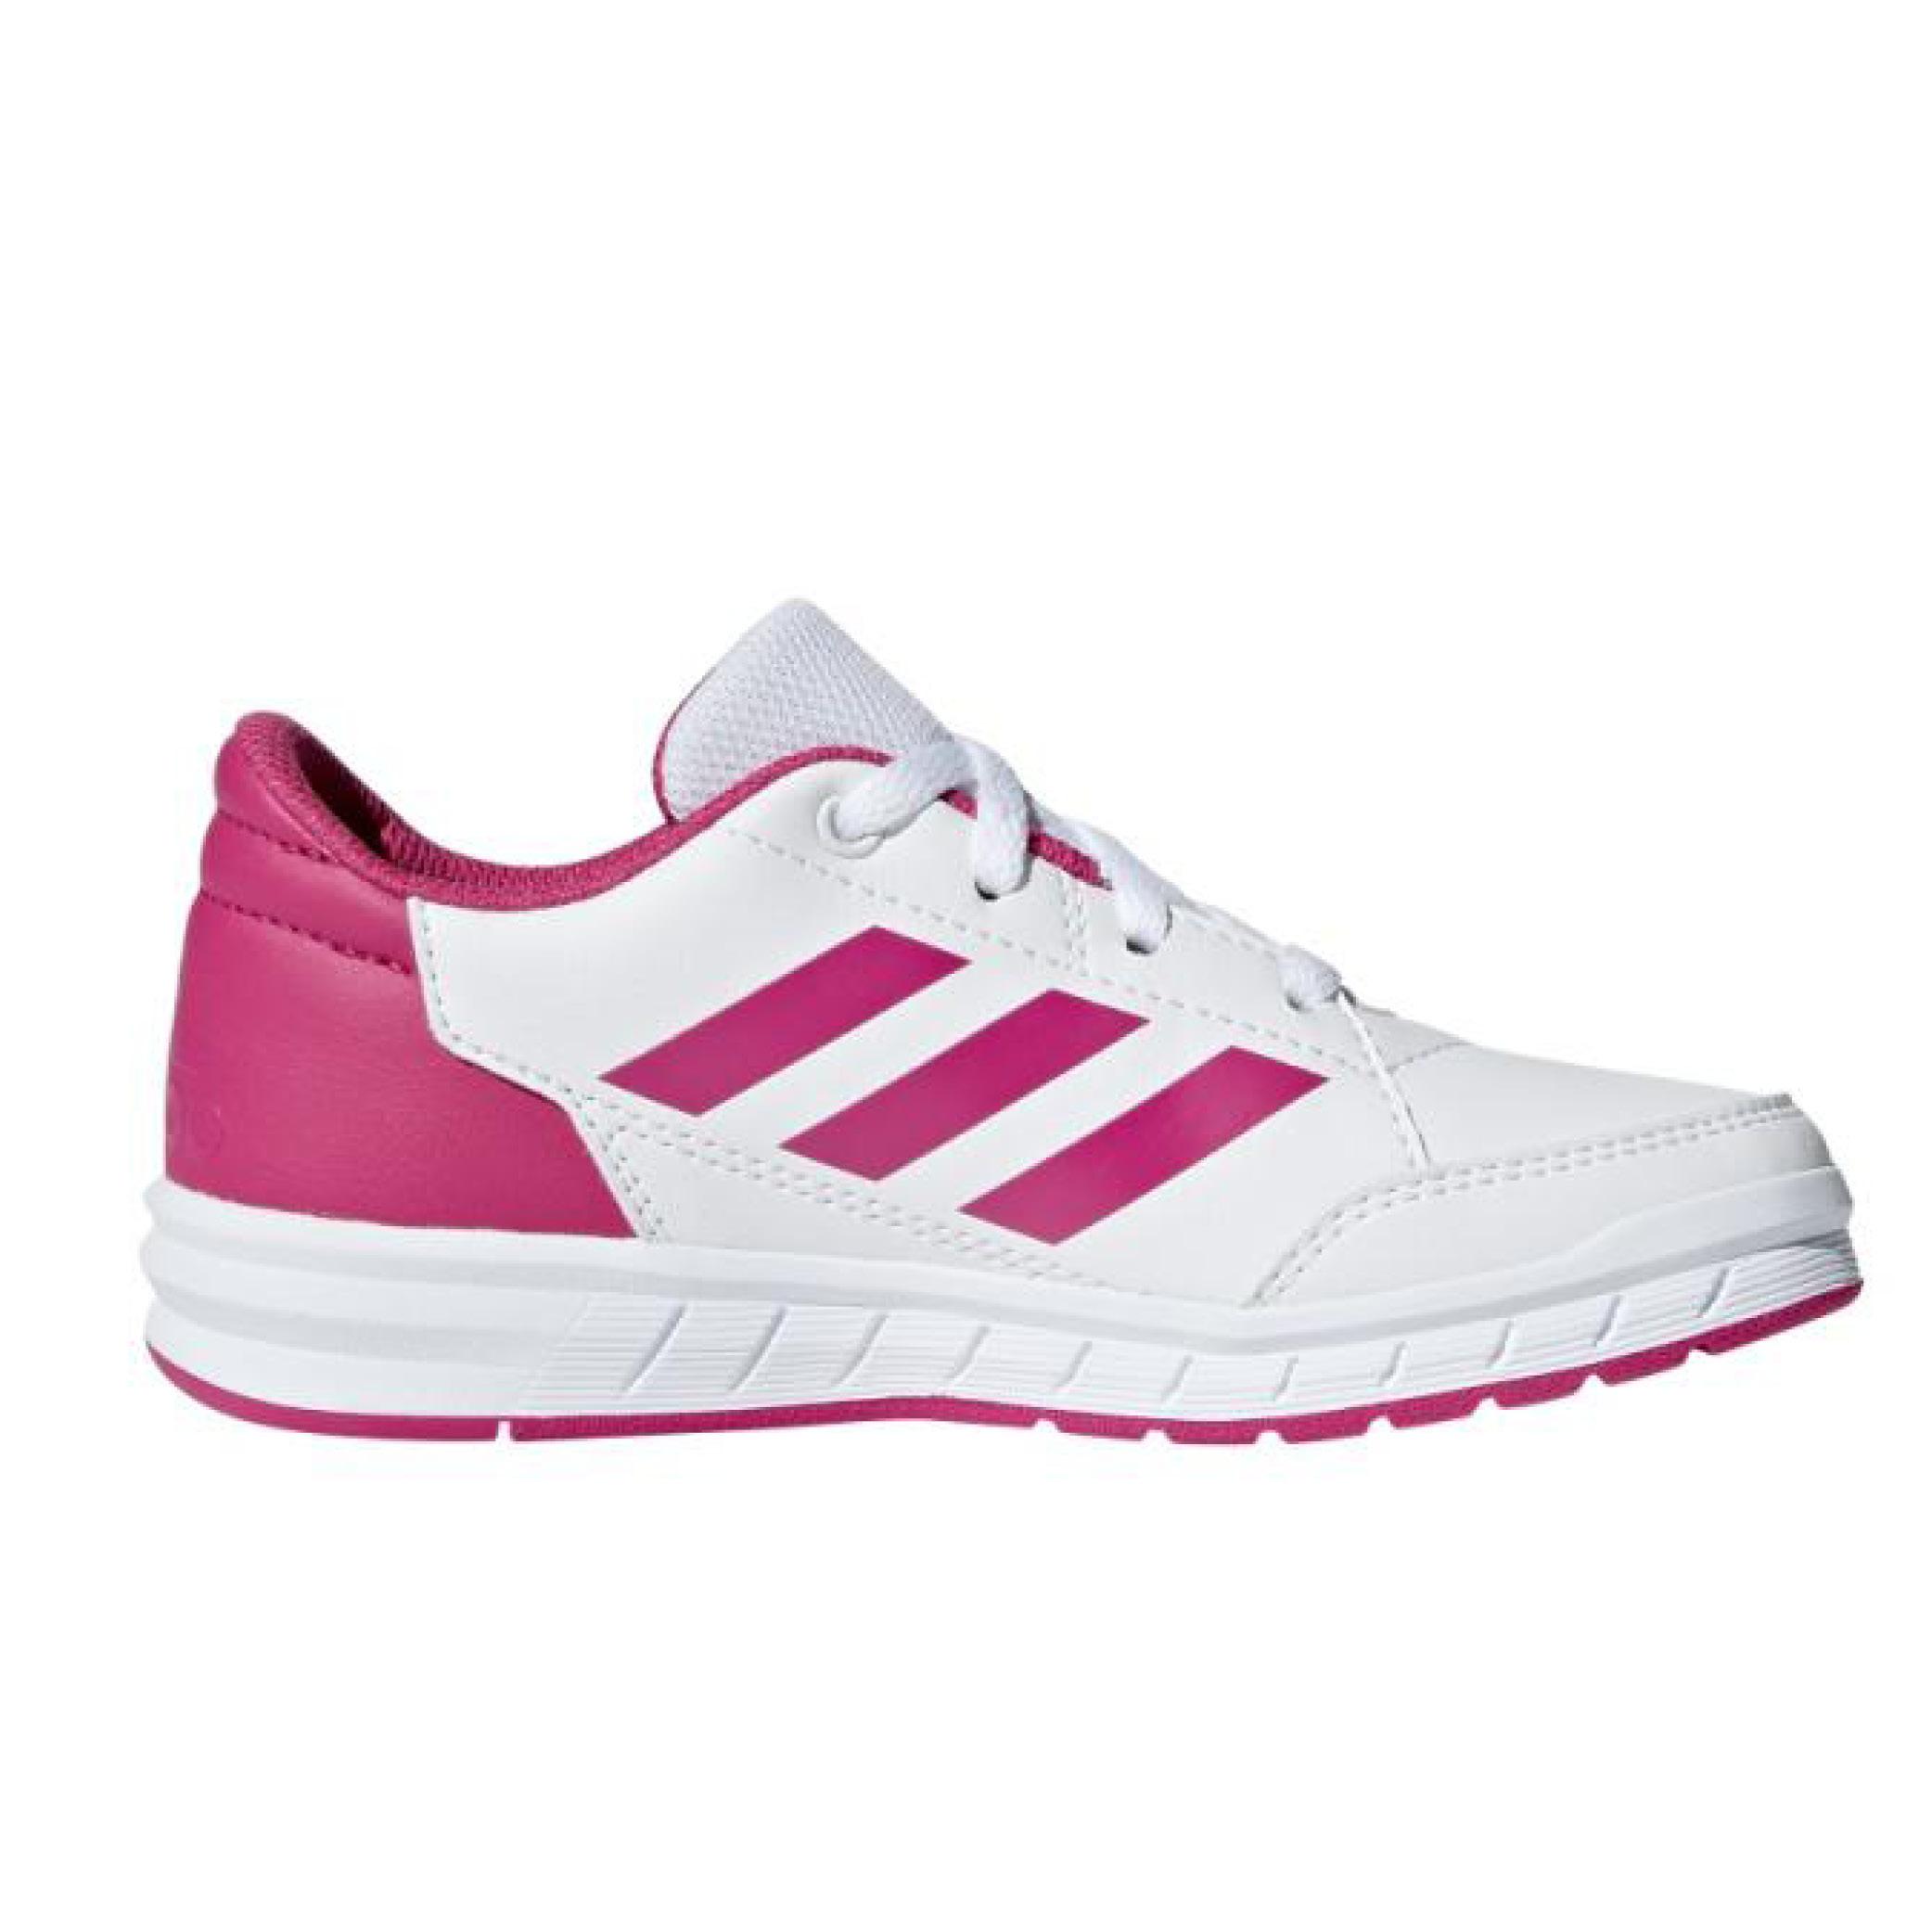 Adidas Altasport Cf K kisfiú utcai cipő